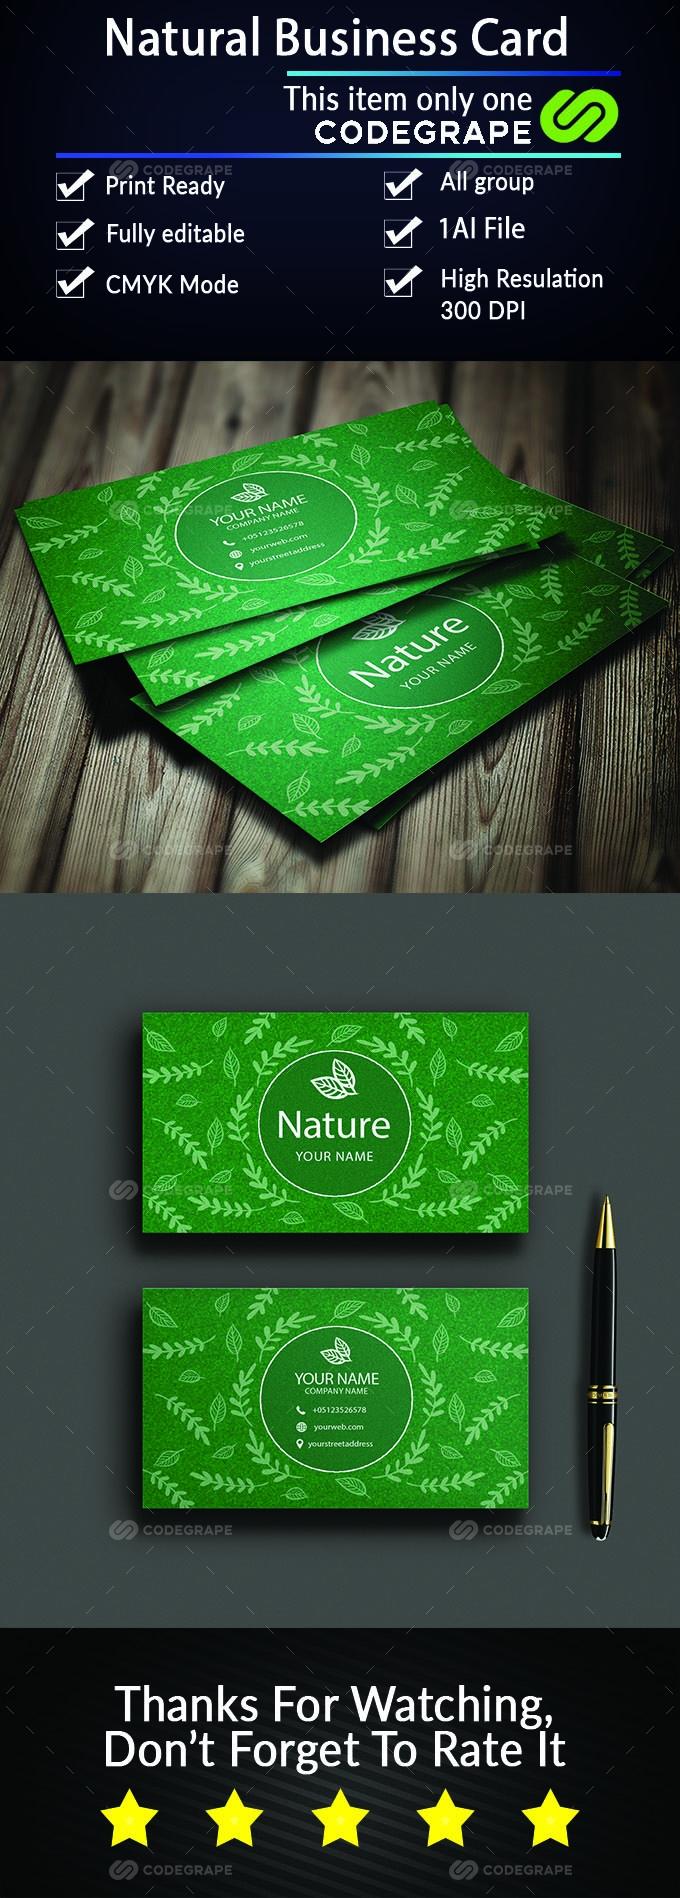 Natural Business Card